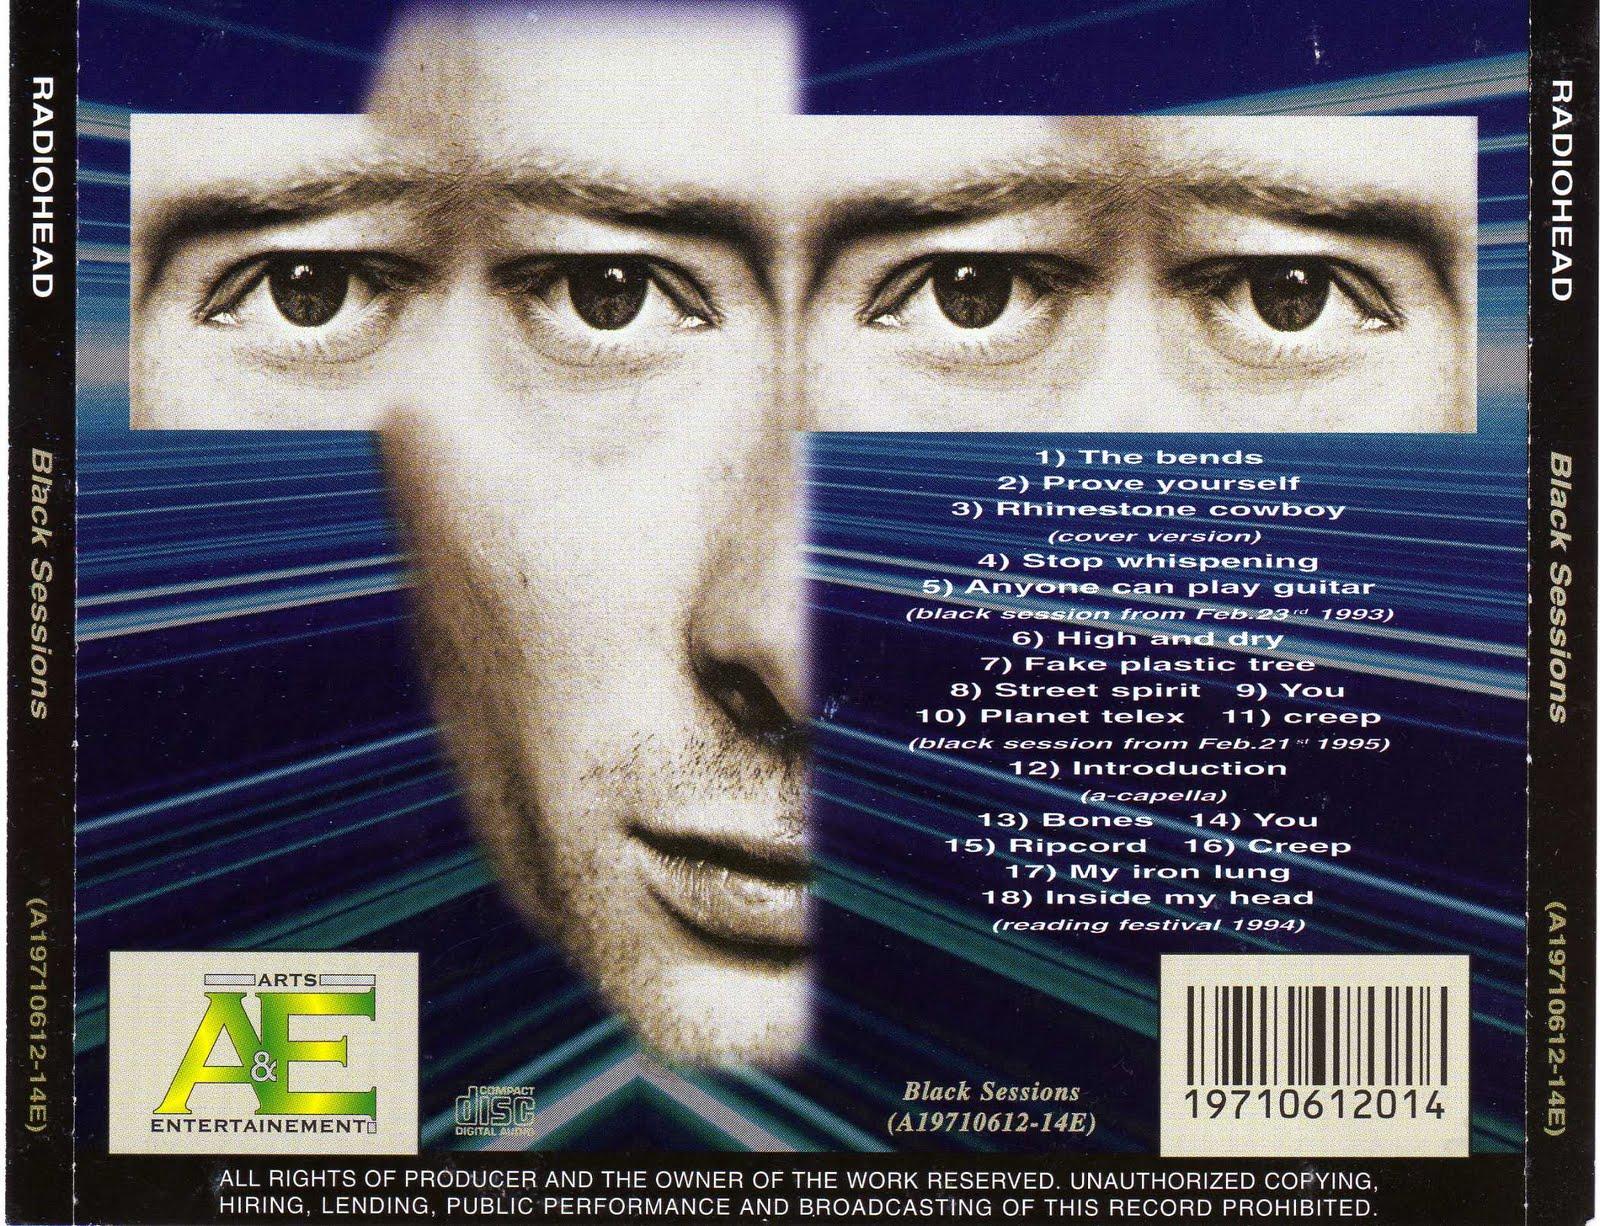 Radiohead Black Sessions